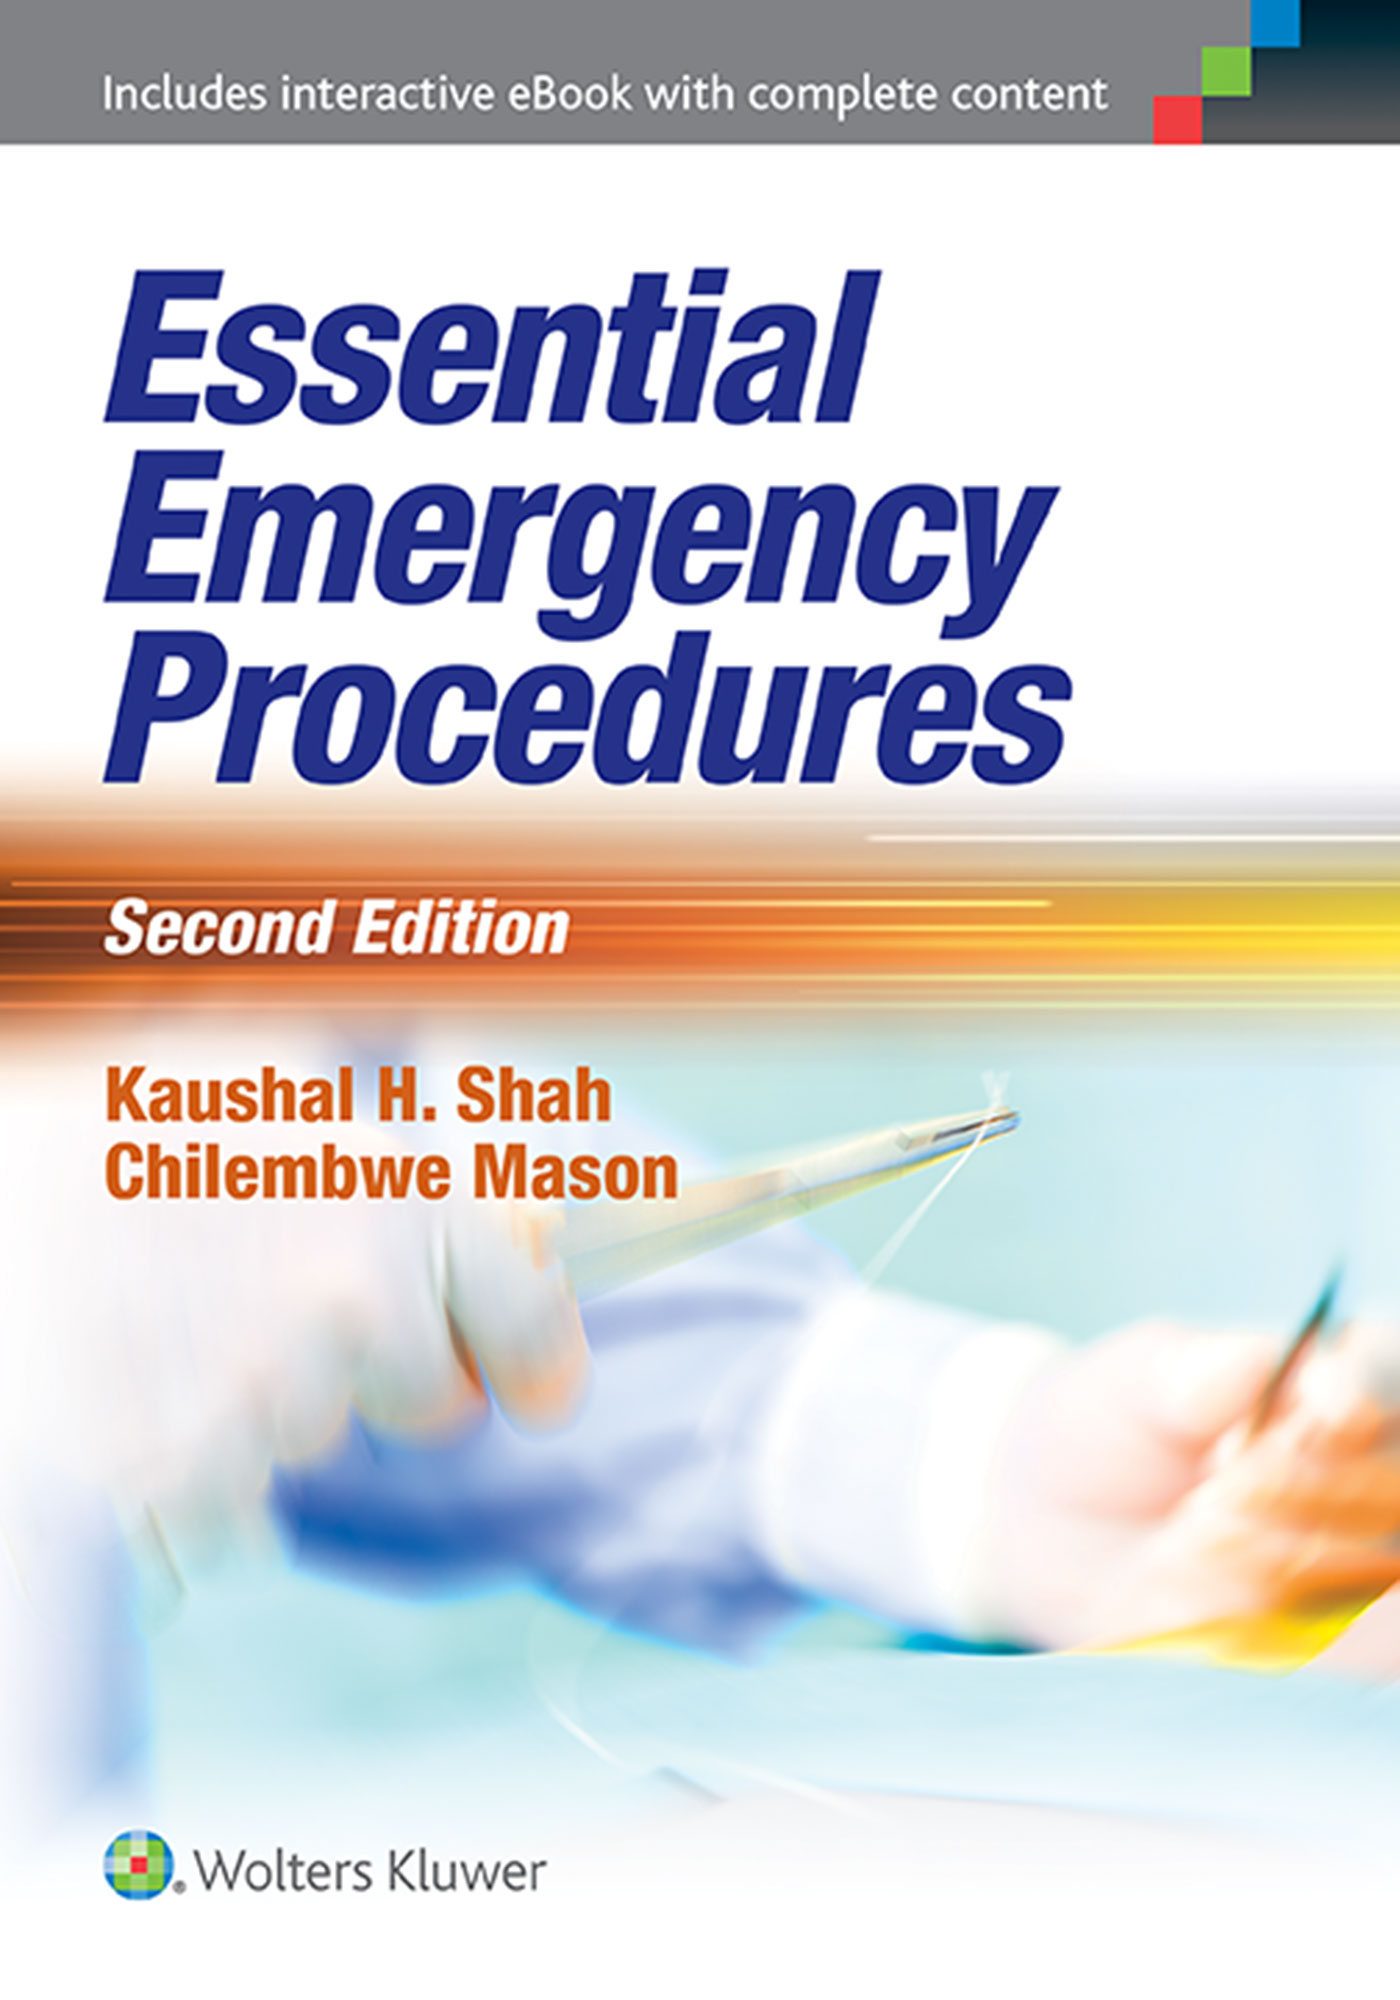 Essential Emergency Procedures